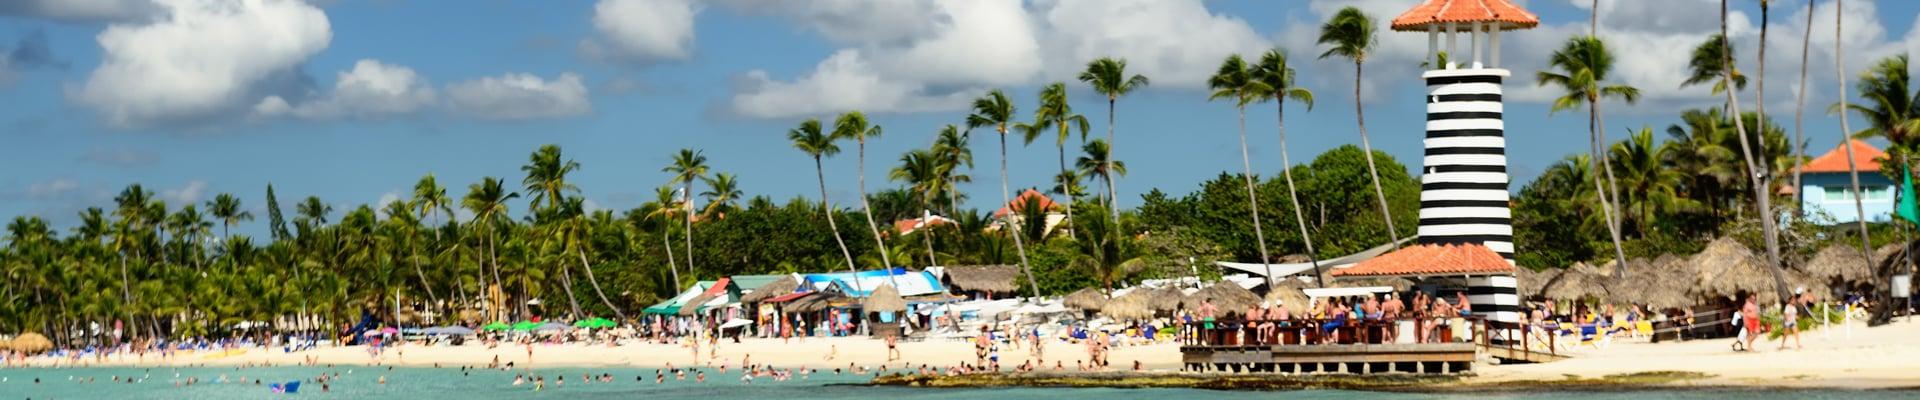 Dominicus Beach in Dominican Republic